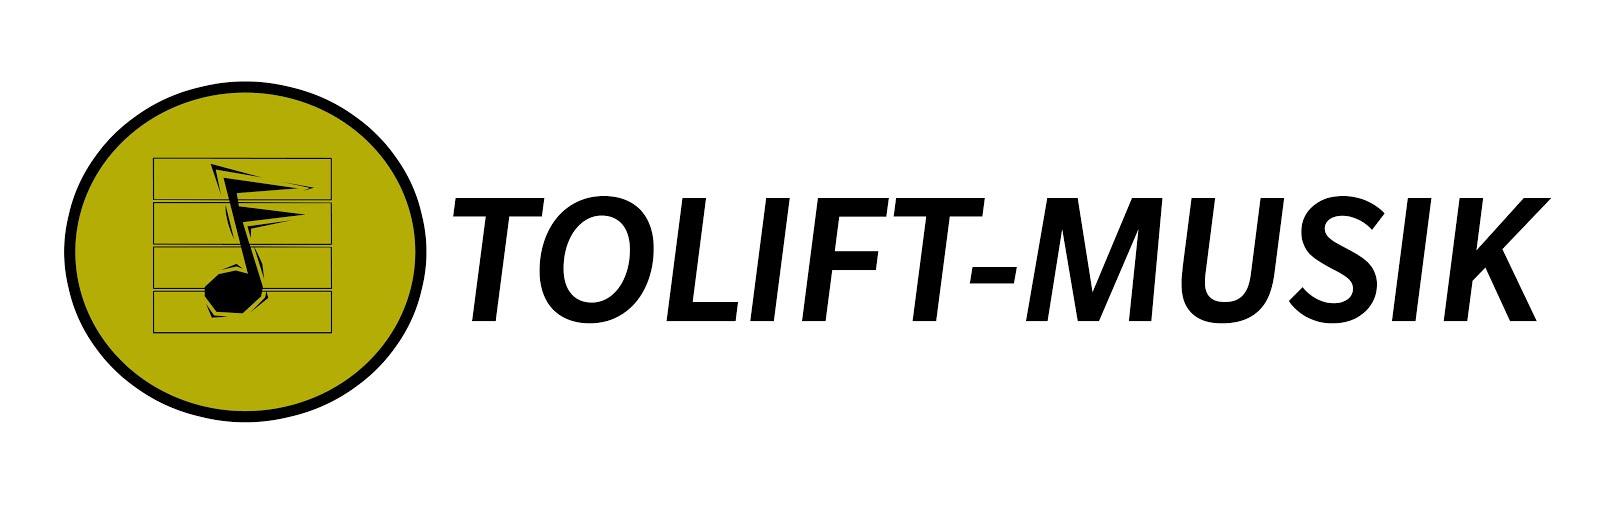 TOLIFT-MUSIK SEGUINDO AS 9DADES